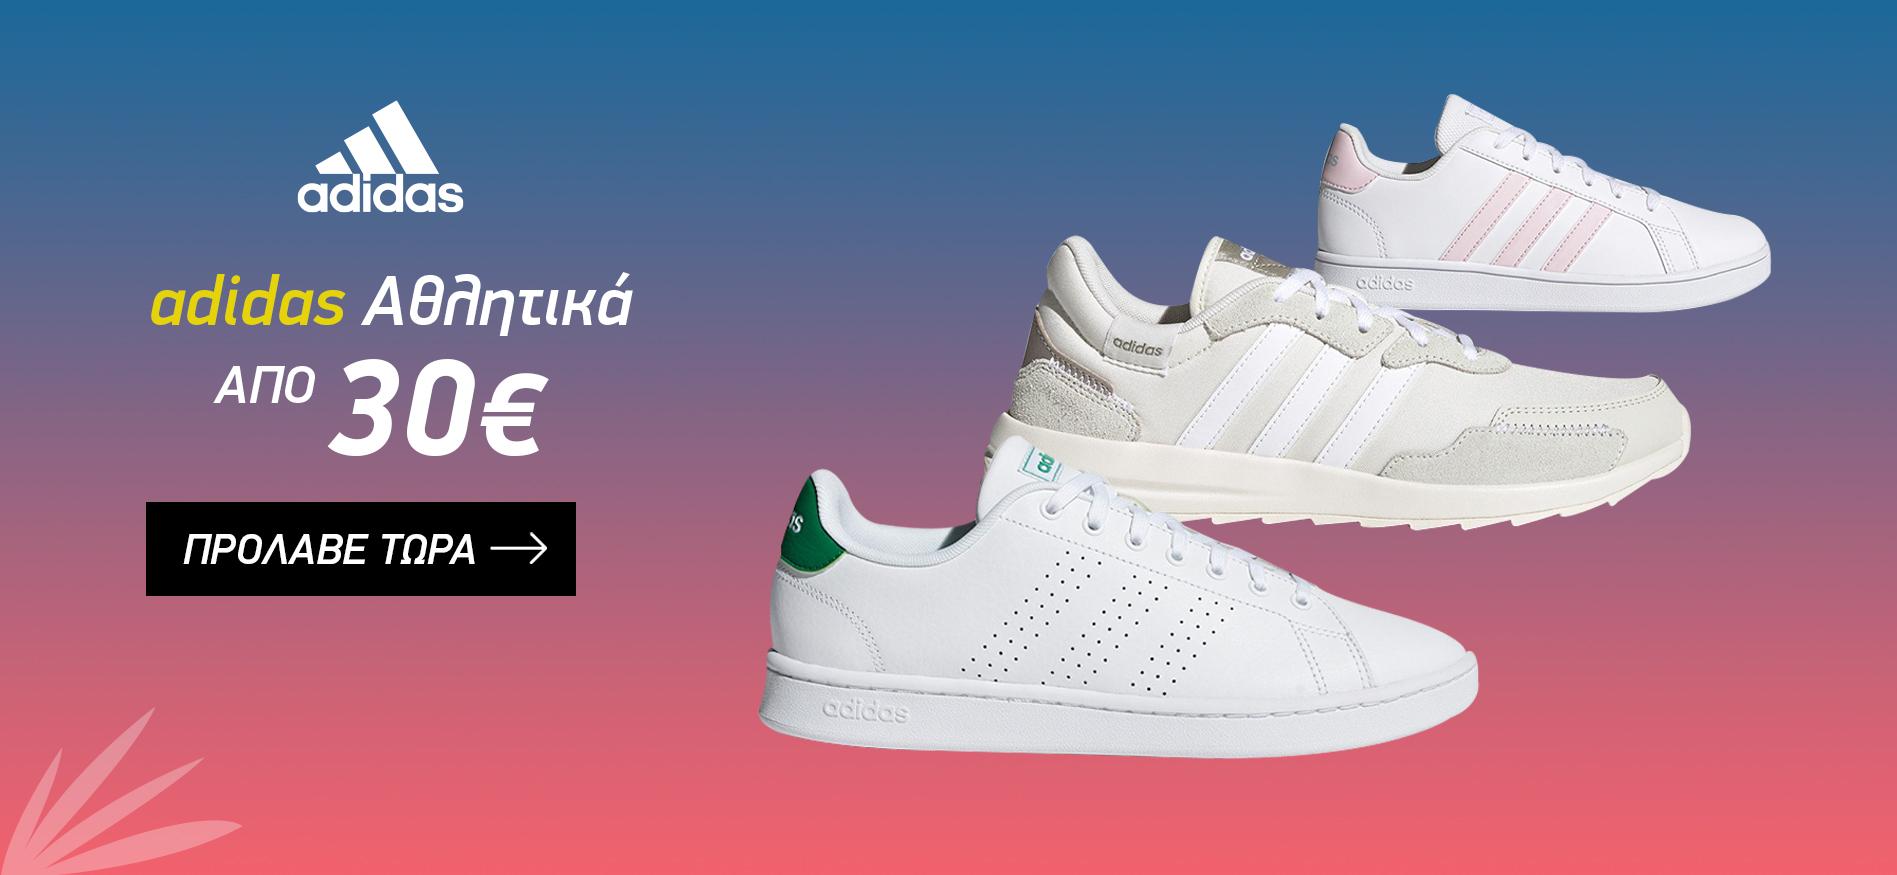 adidas αθλητικά από 30€